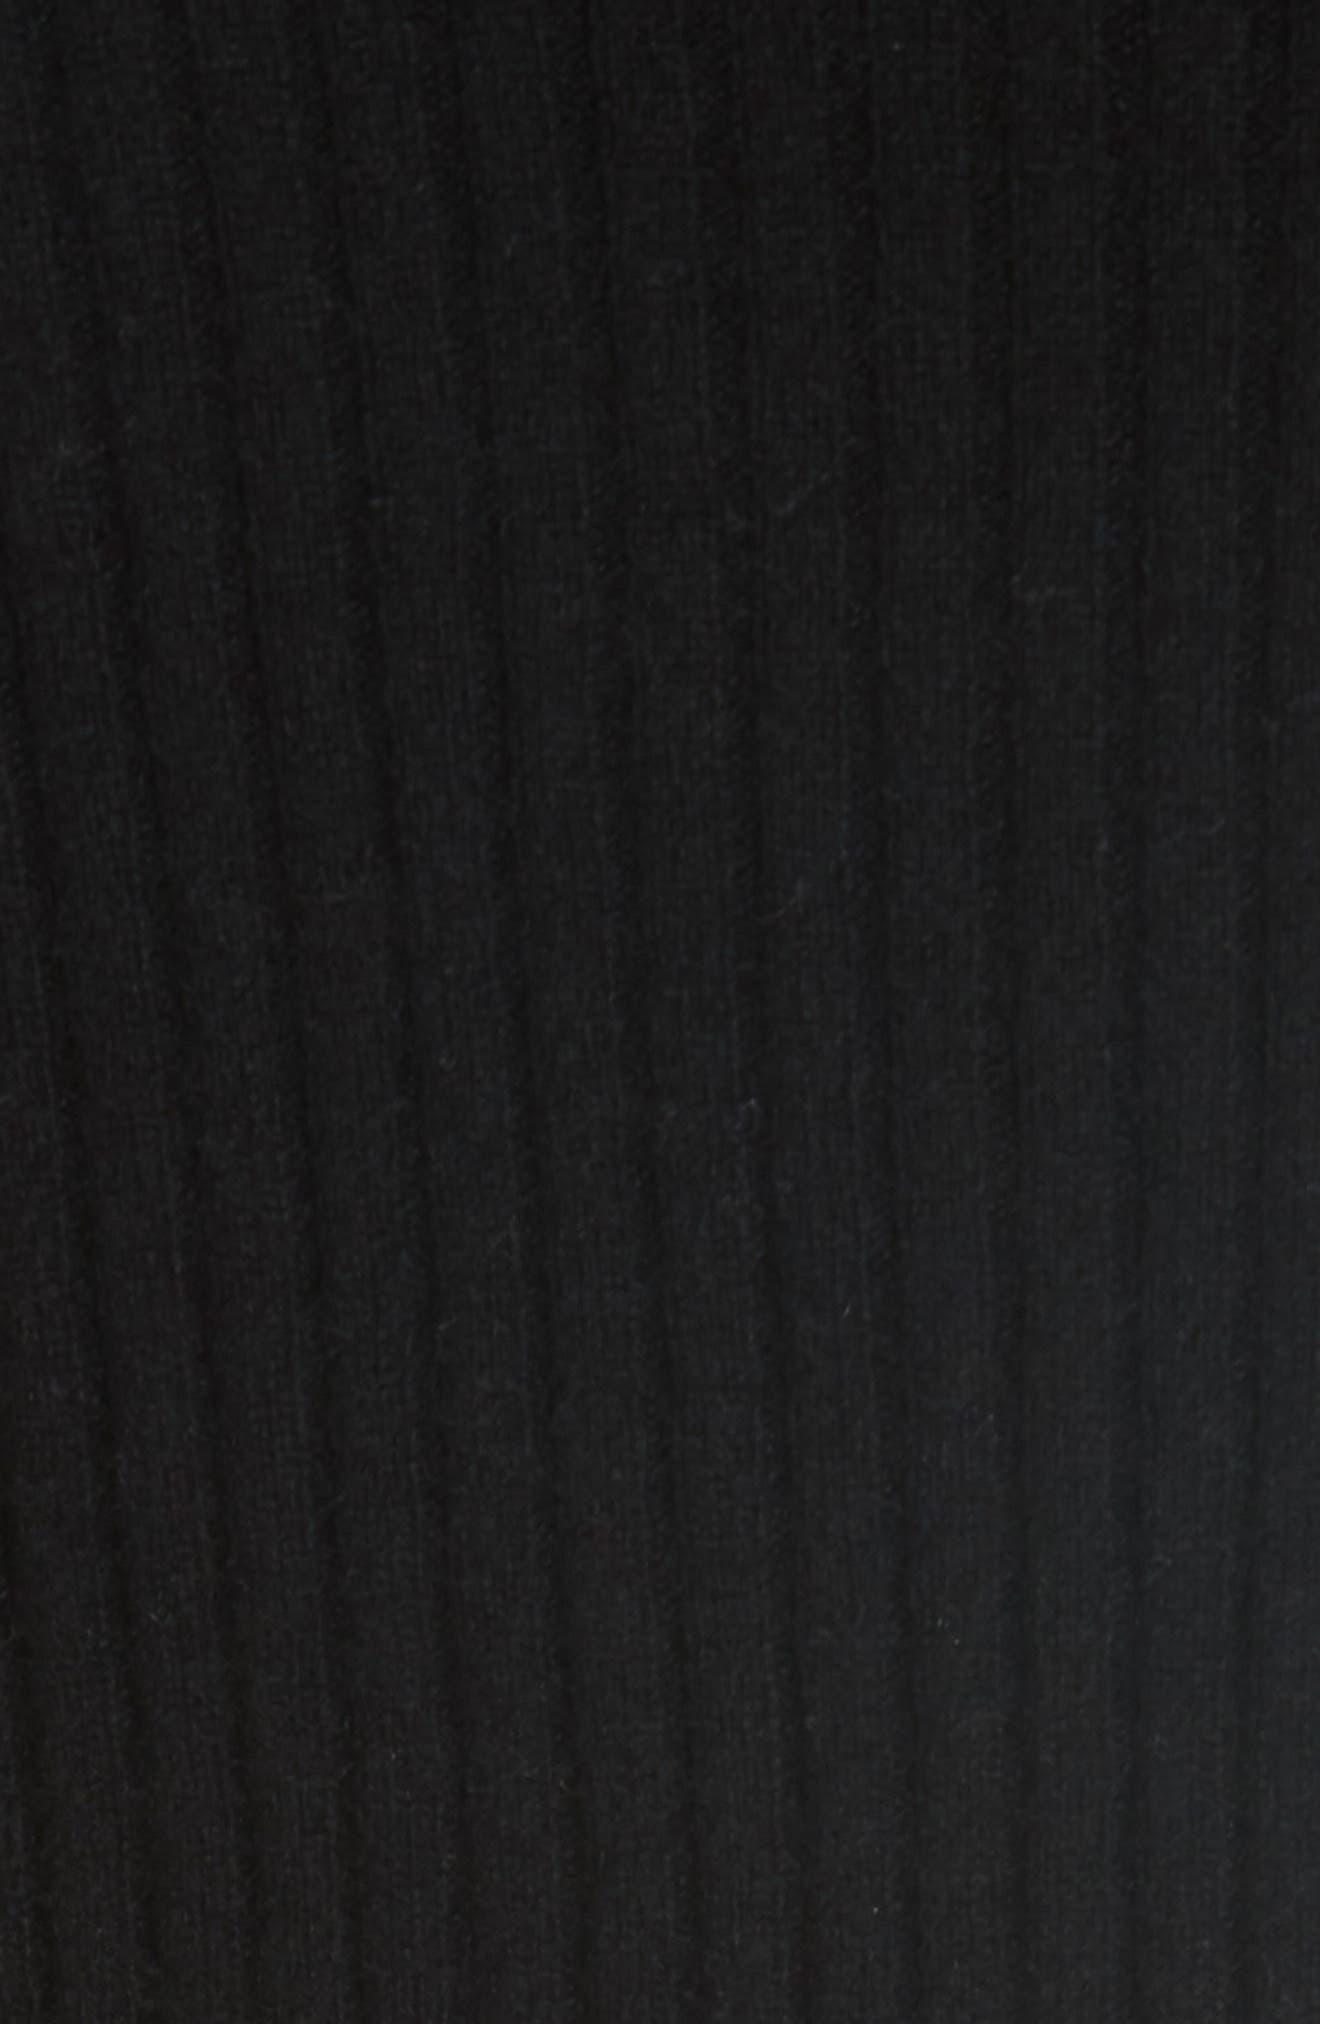 Shoulder Slit Cashmere Crewneck Sweater,                             Alternate thumbnail 5, color,                             BLACK